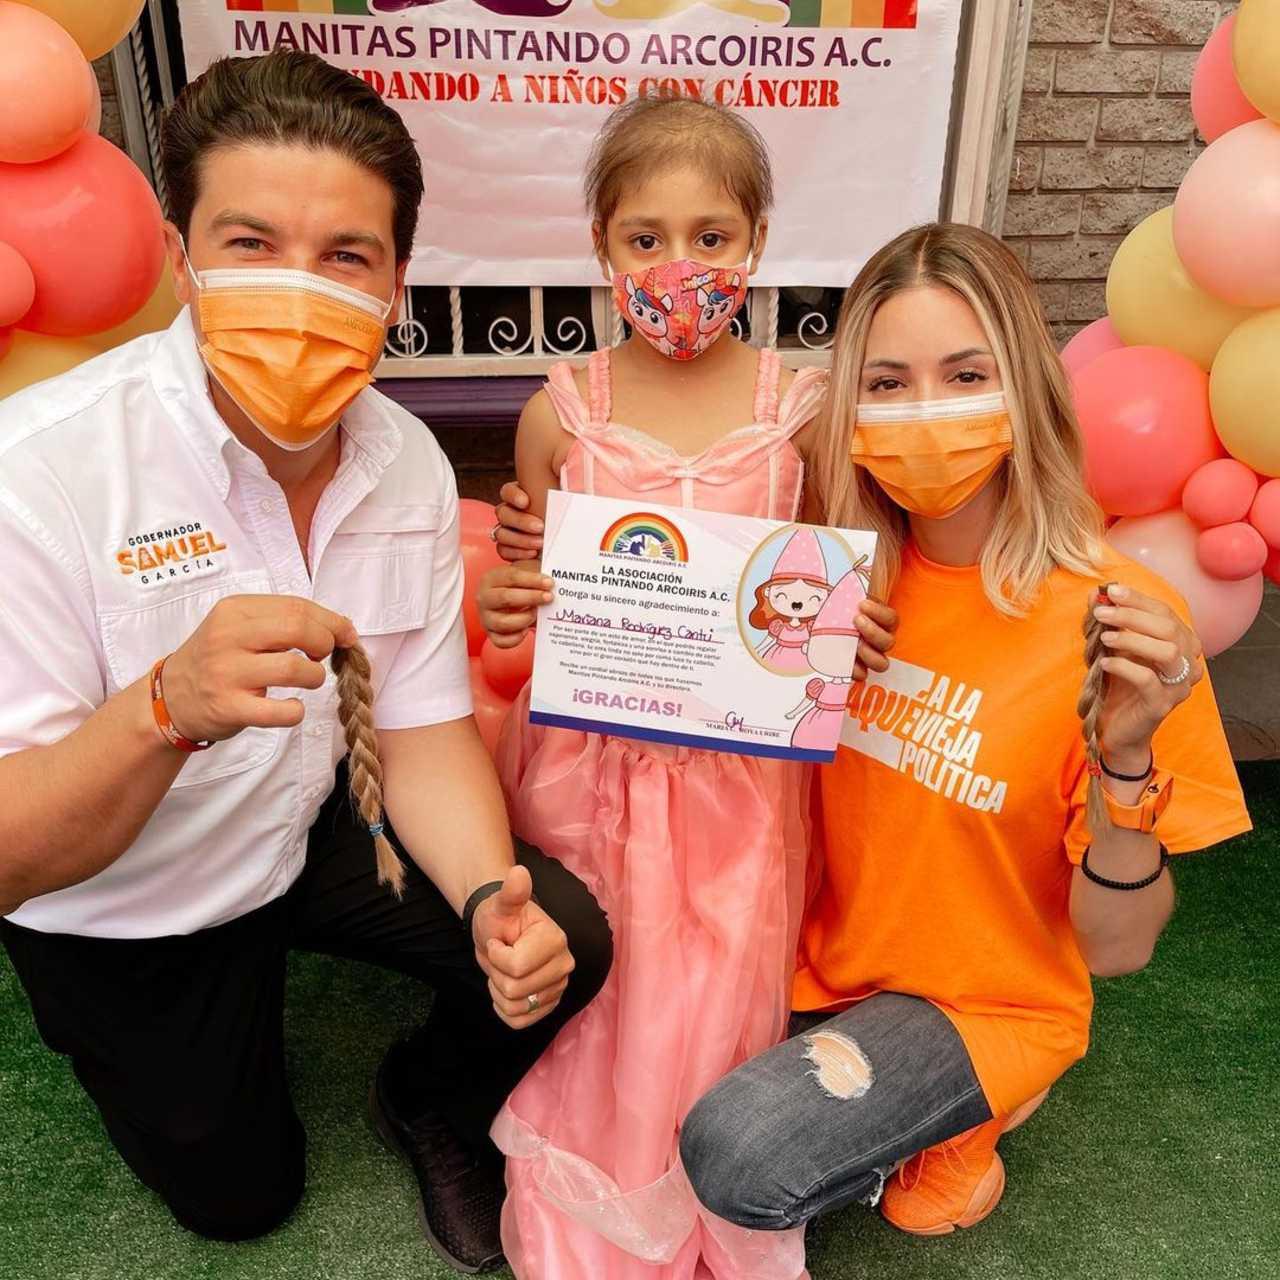 Mariana Rodríguez dona cabello críticas cortarse puntas